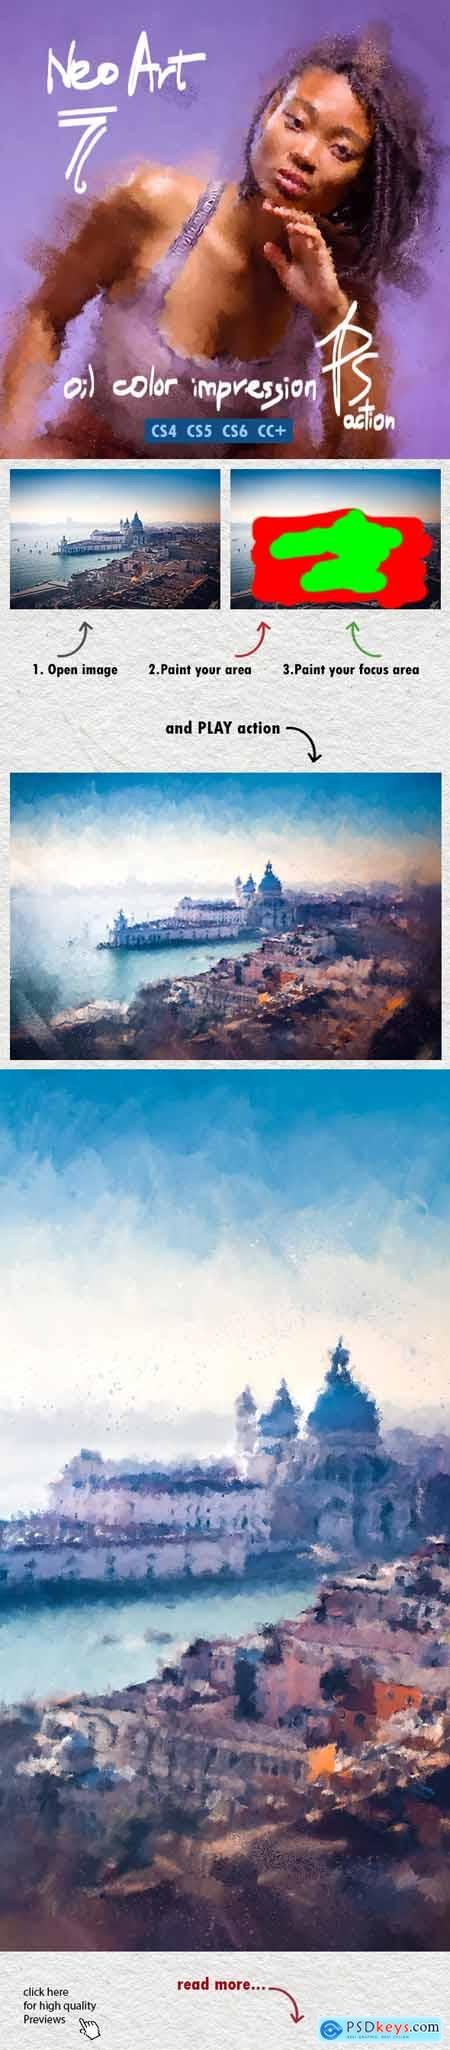 NEOart 7 Oil Paint Impression Advanced 24233039